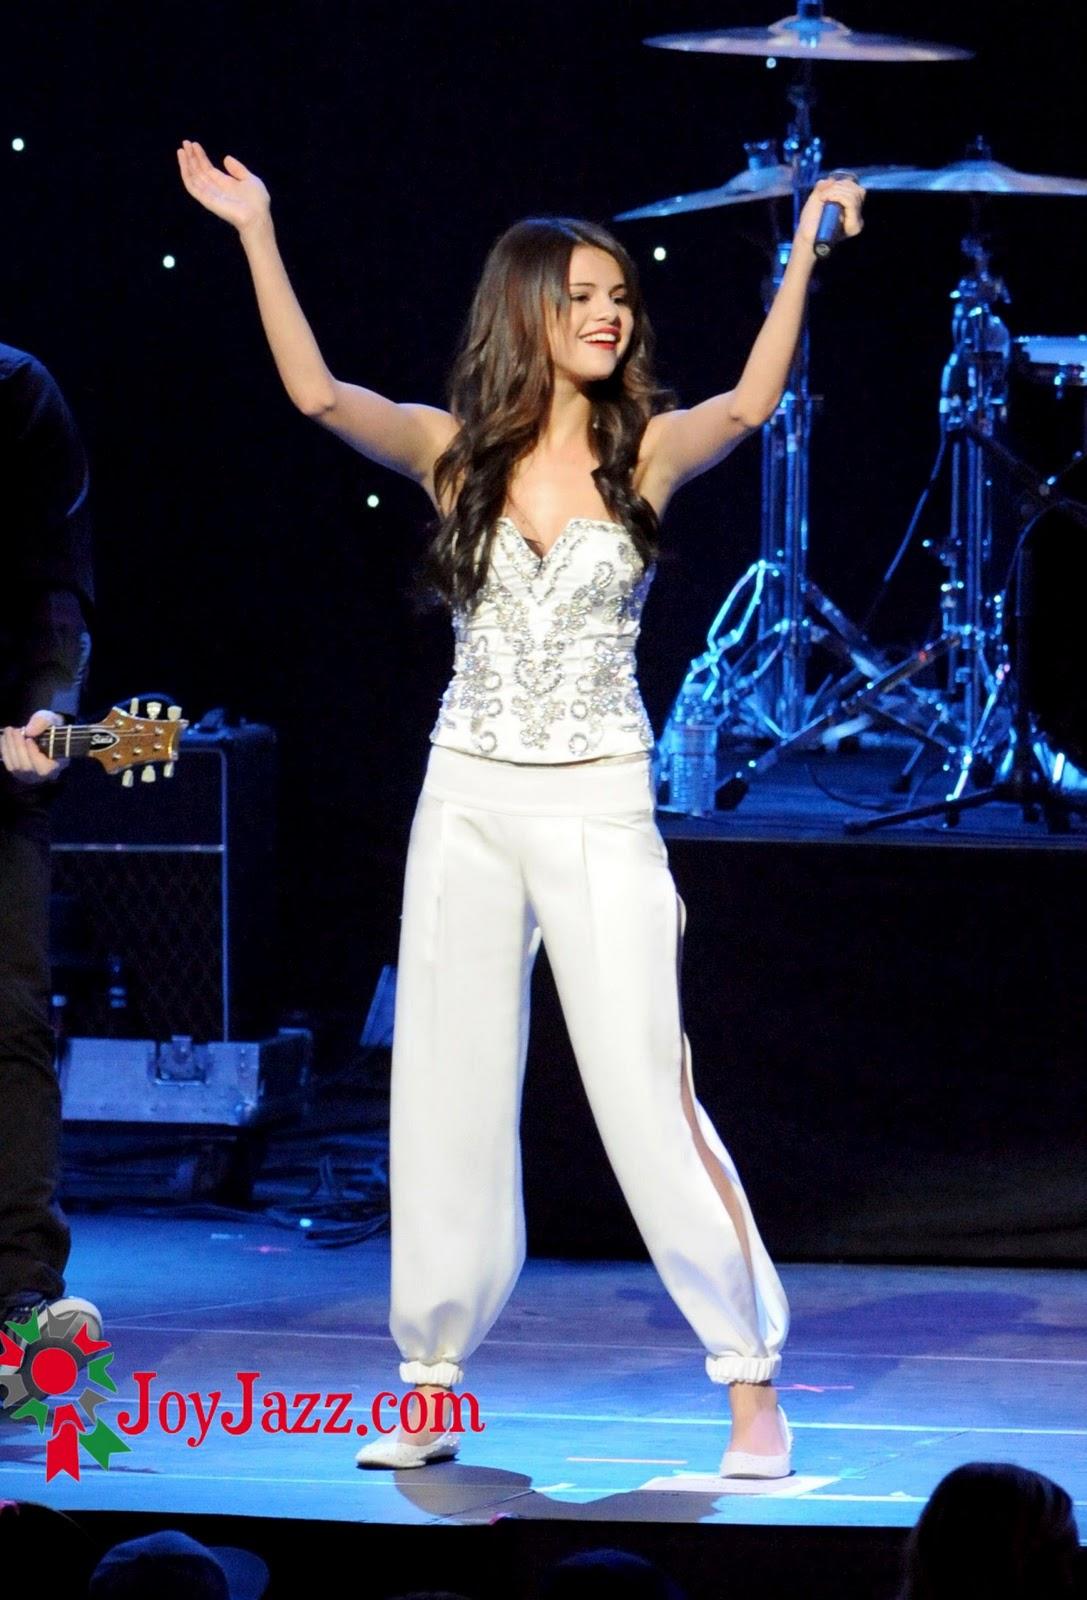 http://1.bp.blogspot.com/_0LdSrYkvVVk/TQeeypfqABI/AAAAAAAABWA/yTK0nR9V6u4/s1600/Selena-Gomez-17.jpg